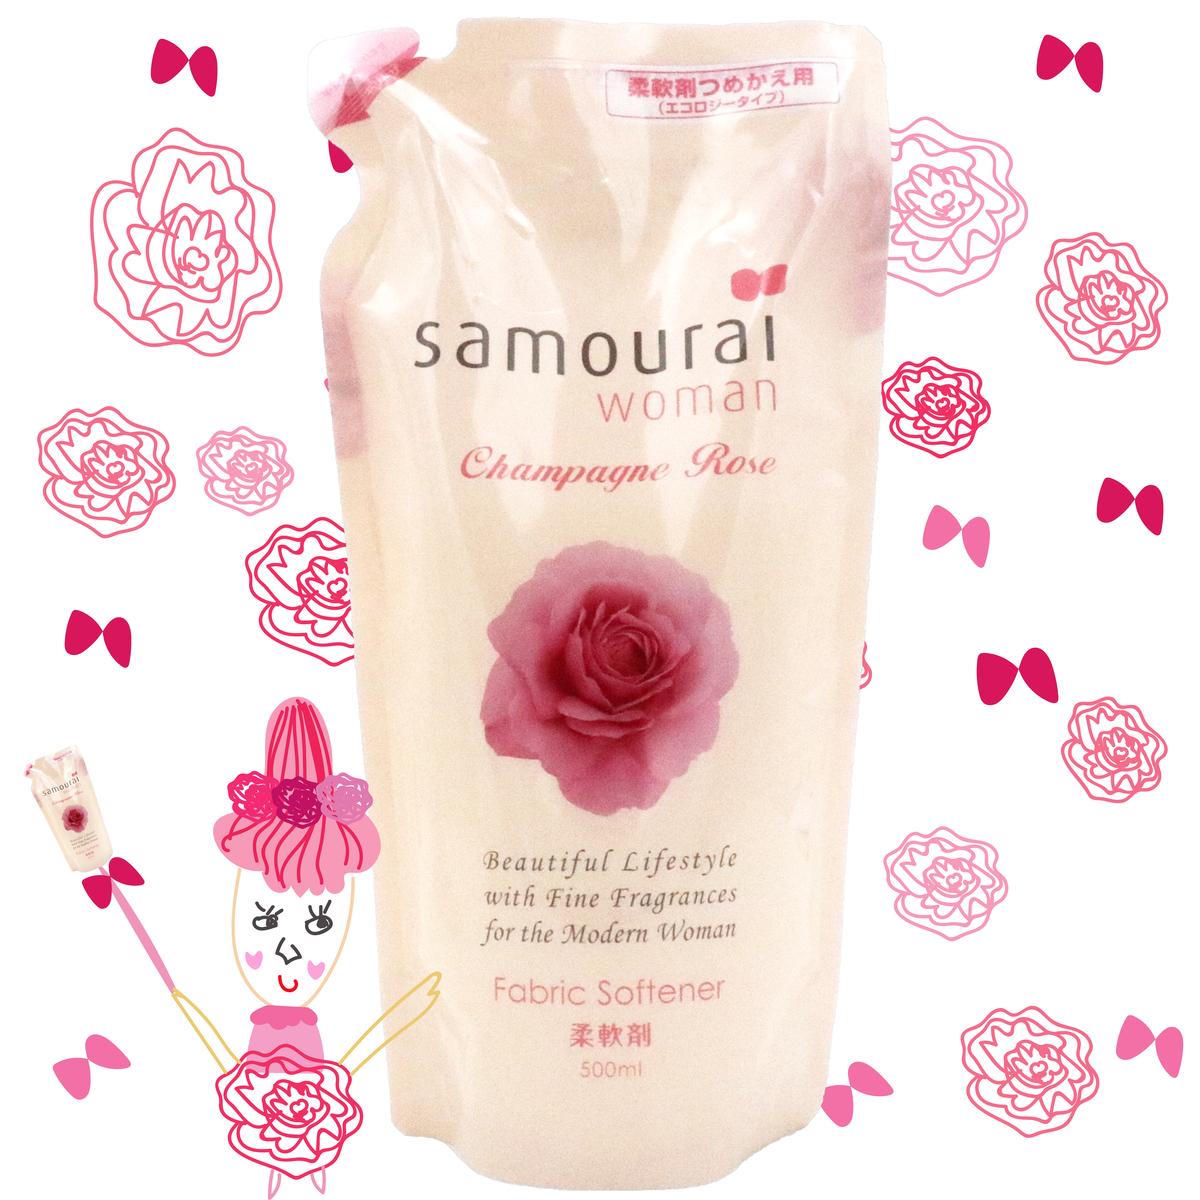 Samourai Woman抗菌,防臭,防靜電,防起毛粒,香檳玫瑰柔順劑補充裝 500ml